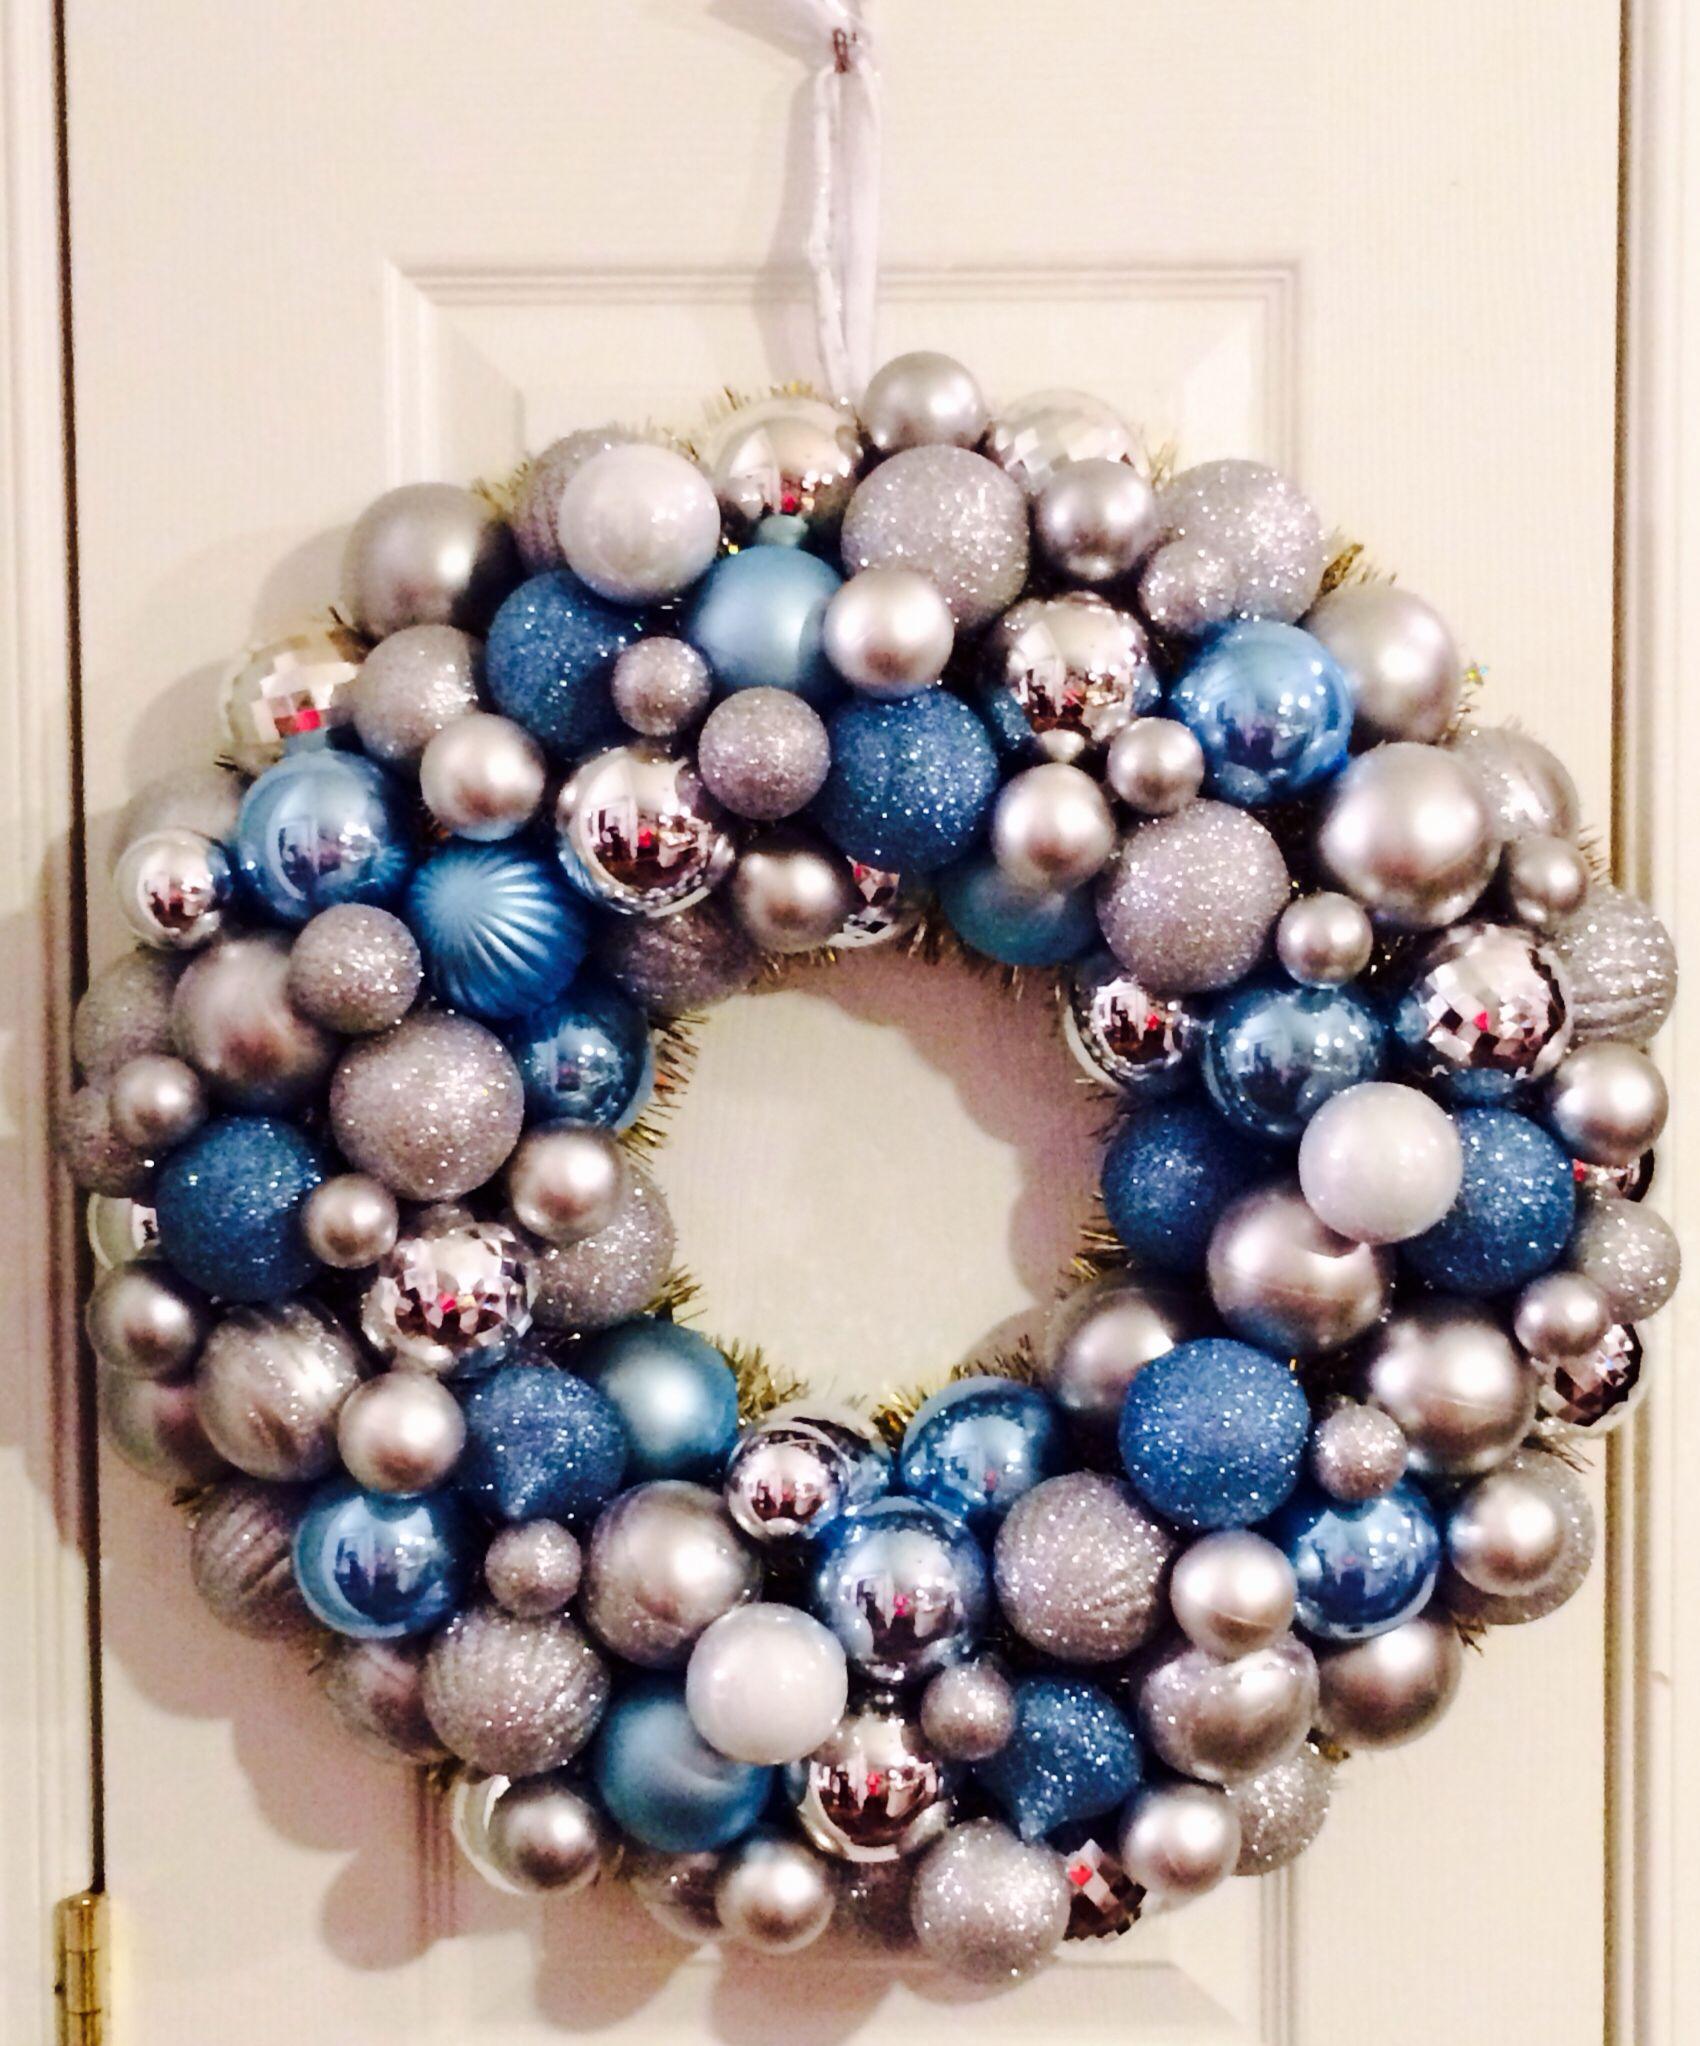 Handmade Ornament Wreath Blue Gold Xmas Wreaths Ornament Wreath Handmade Ornaments